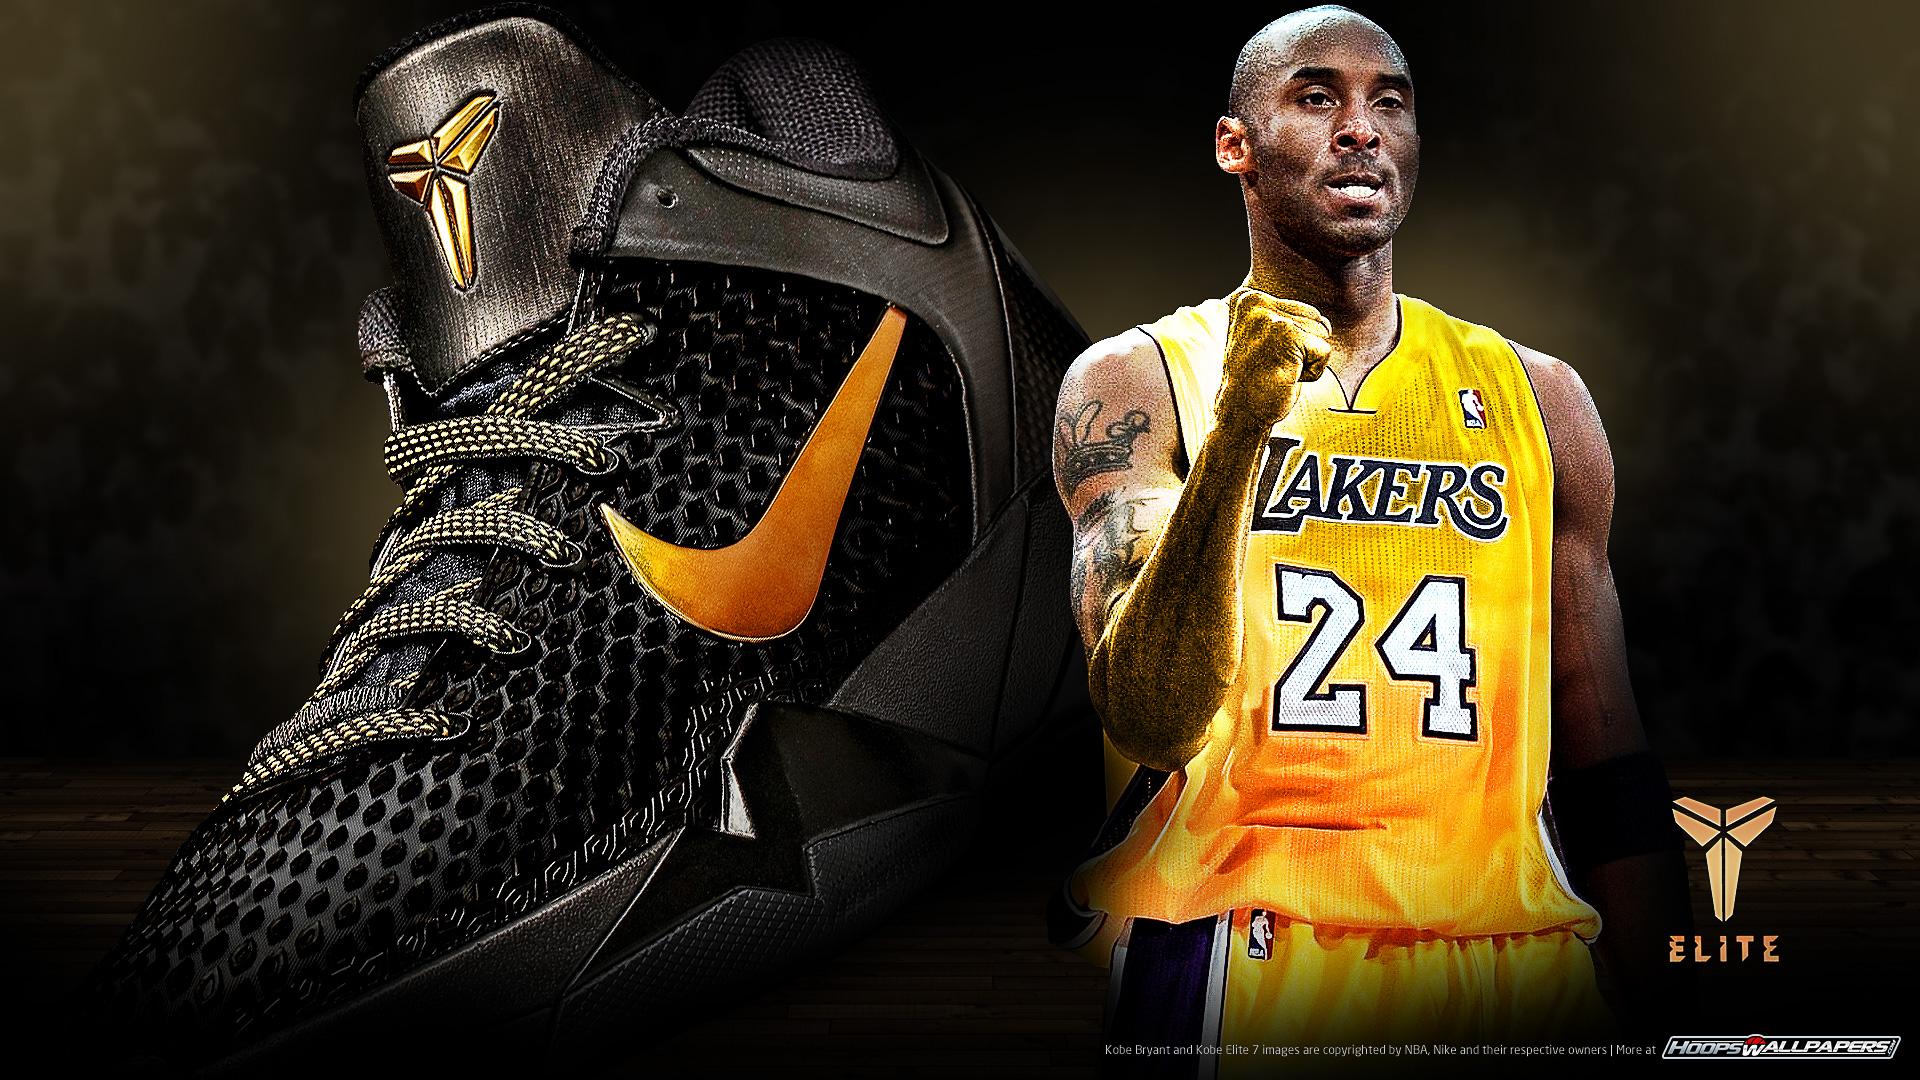 Download Kobe Bryant Nike Wallpaper HD 2967 Full Size 1920x1080